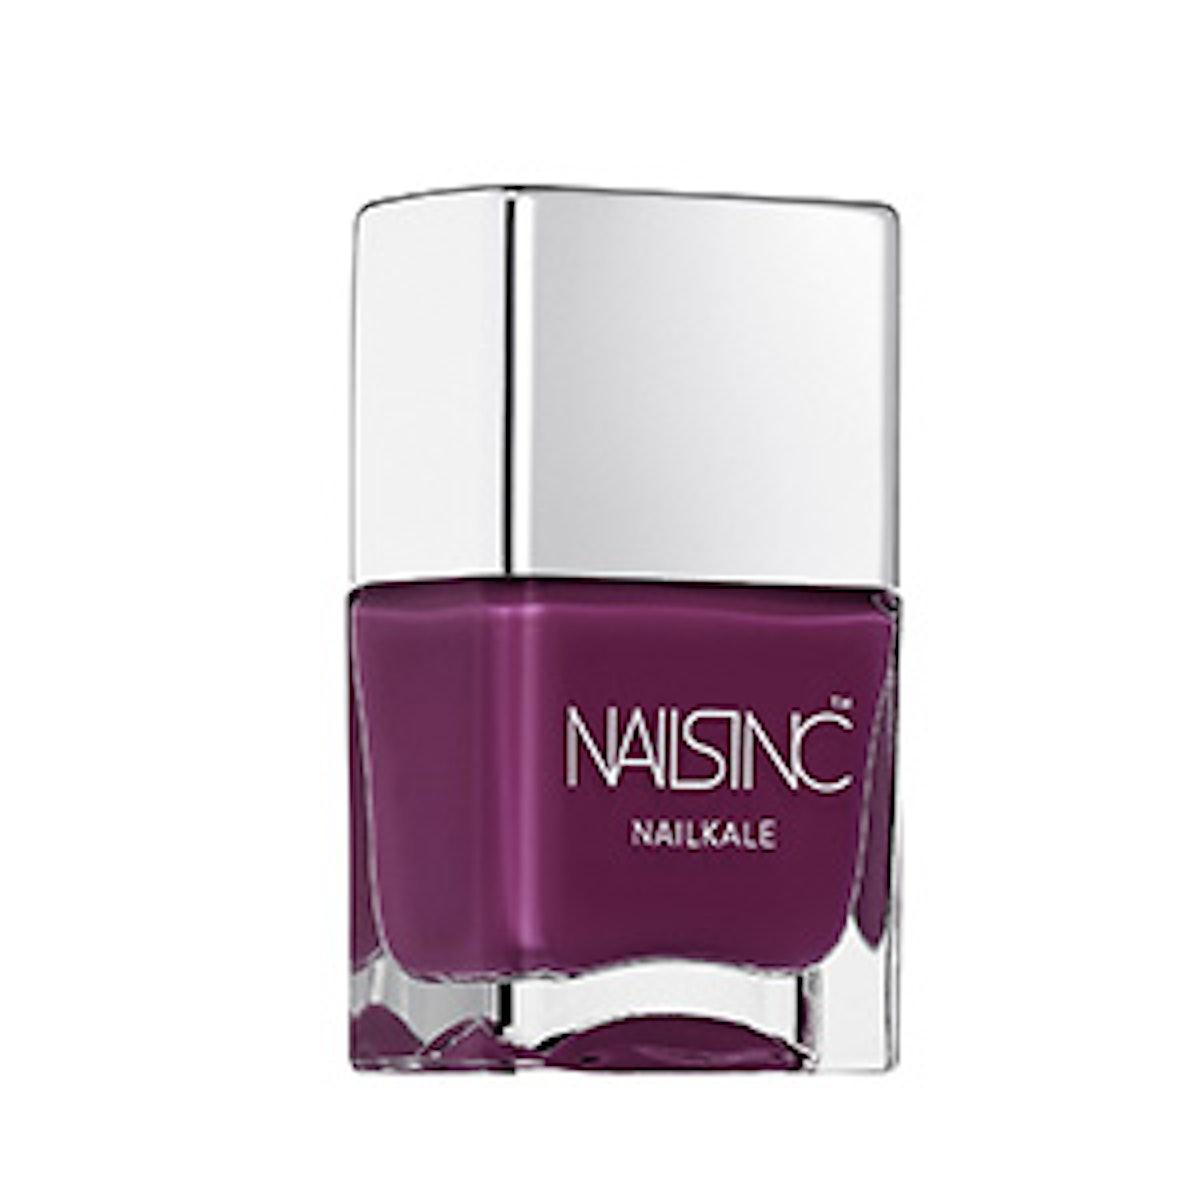 Nailkale In Vivid Purple